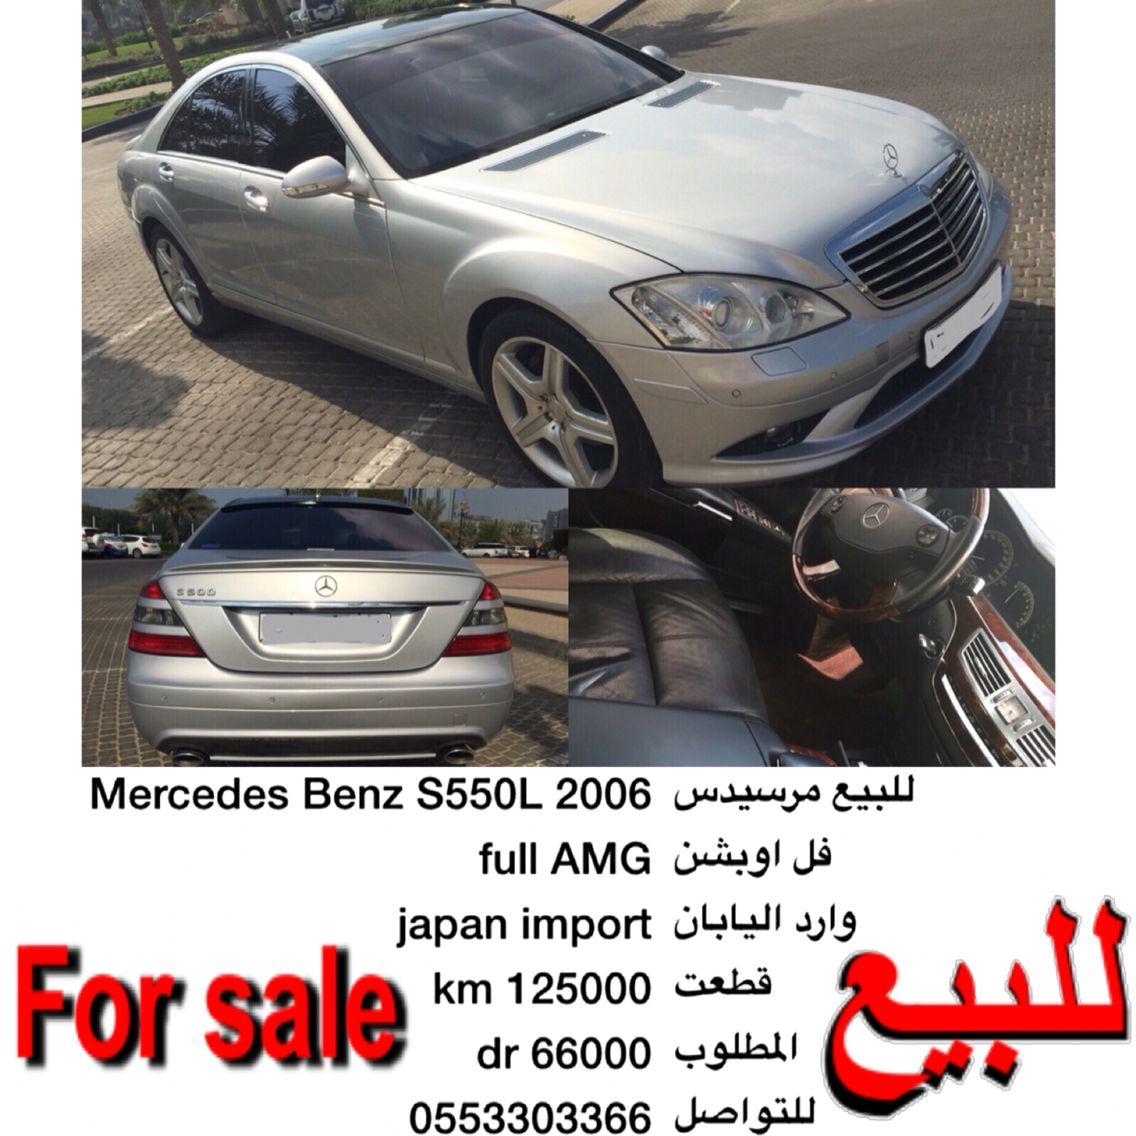 للبيع مرسيدس Mercedes Benz S550l Full Amg 2006 Japan Import 125000 Km 66000 Dr 0553303366 اعلان مدفوع مرسدس واتساب Uae4cars2u لم Benz Mercedes Benz Mercedes